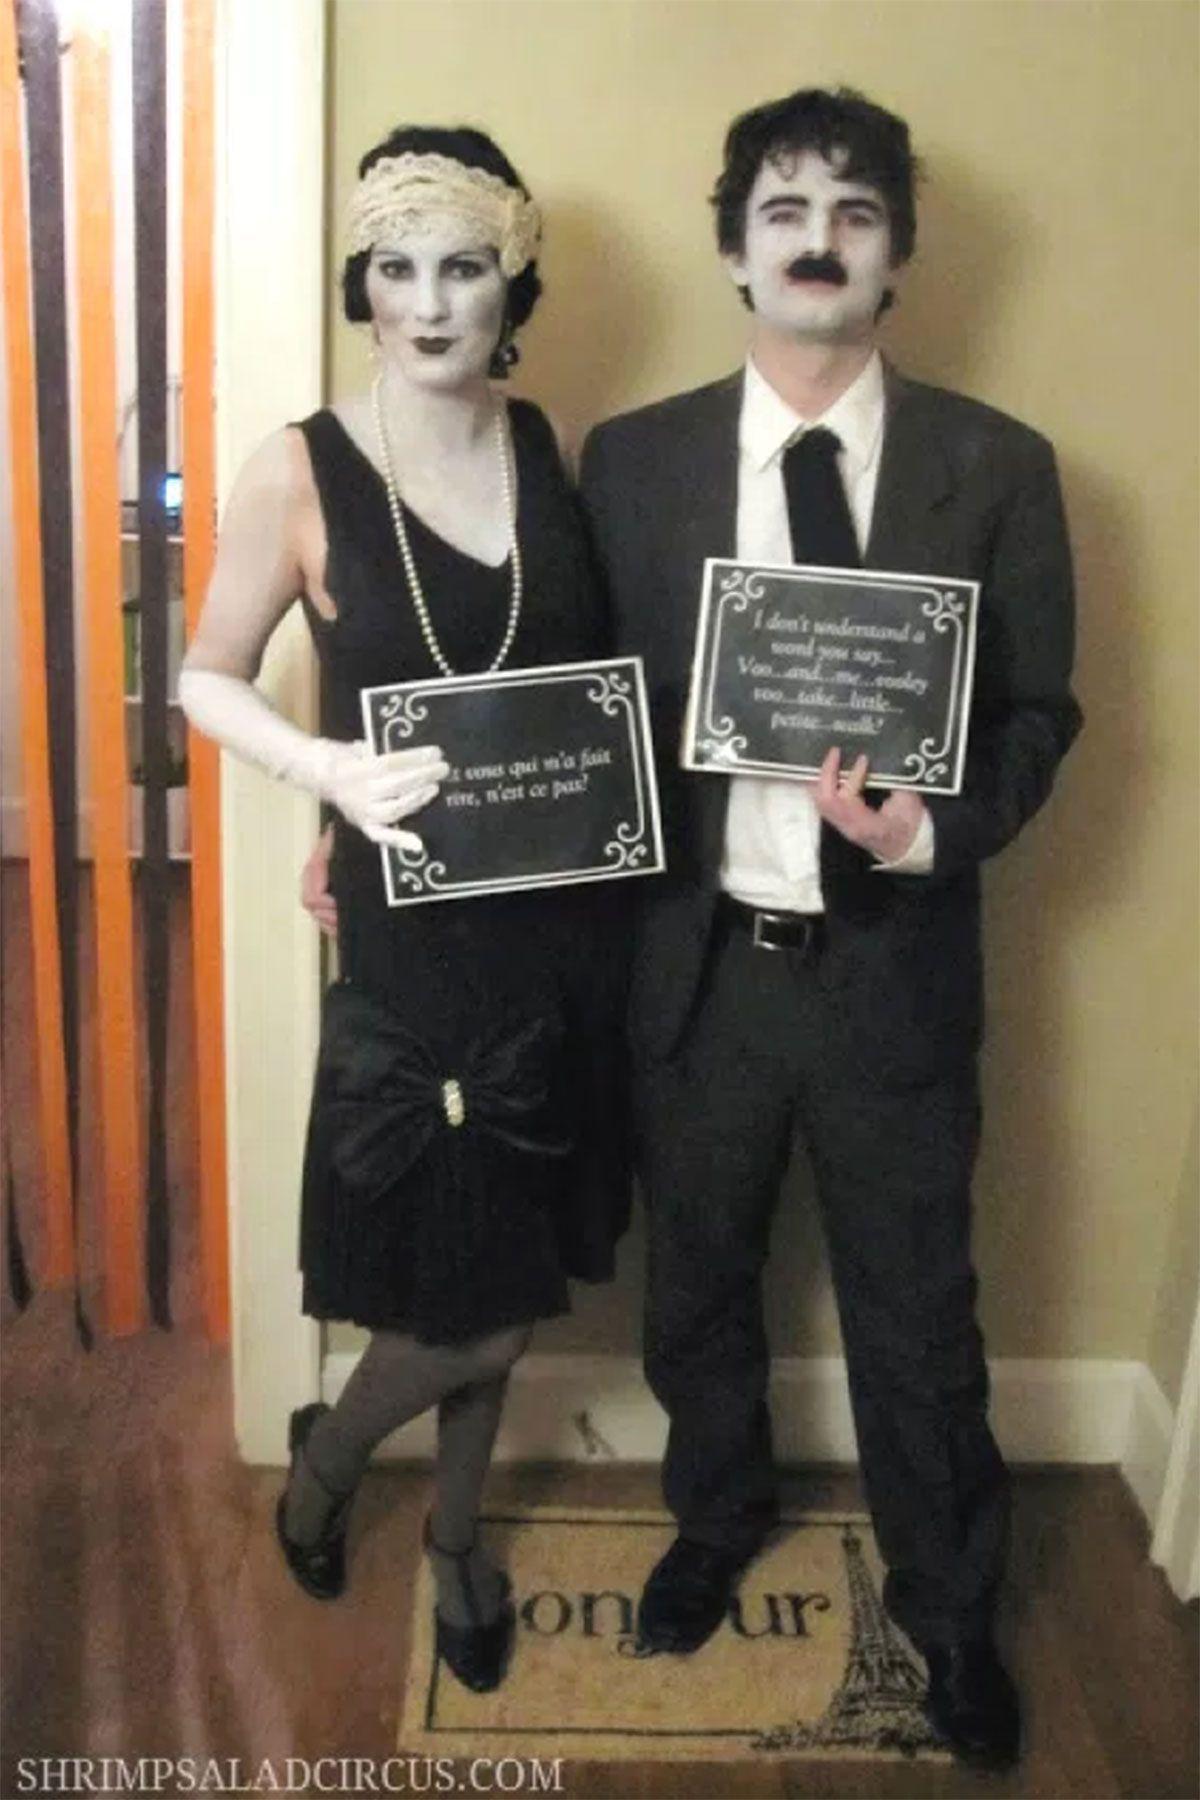 nasty-couples-halloween-costumes